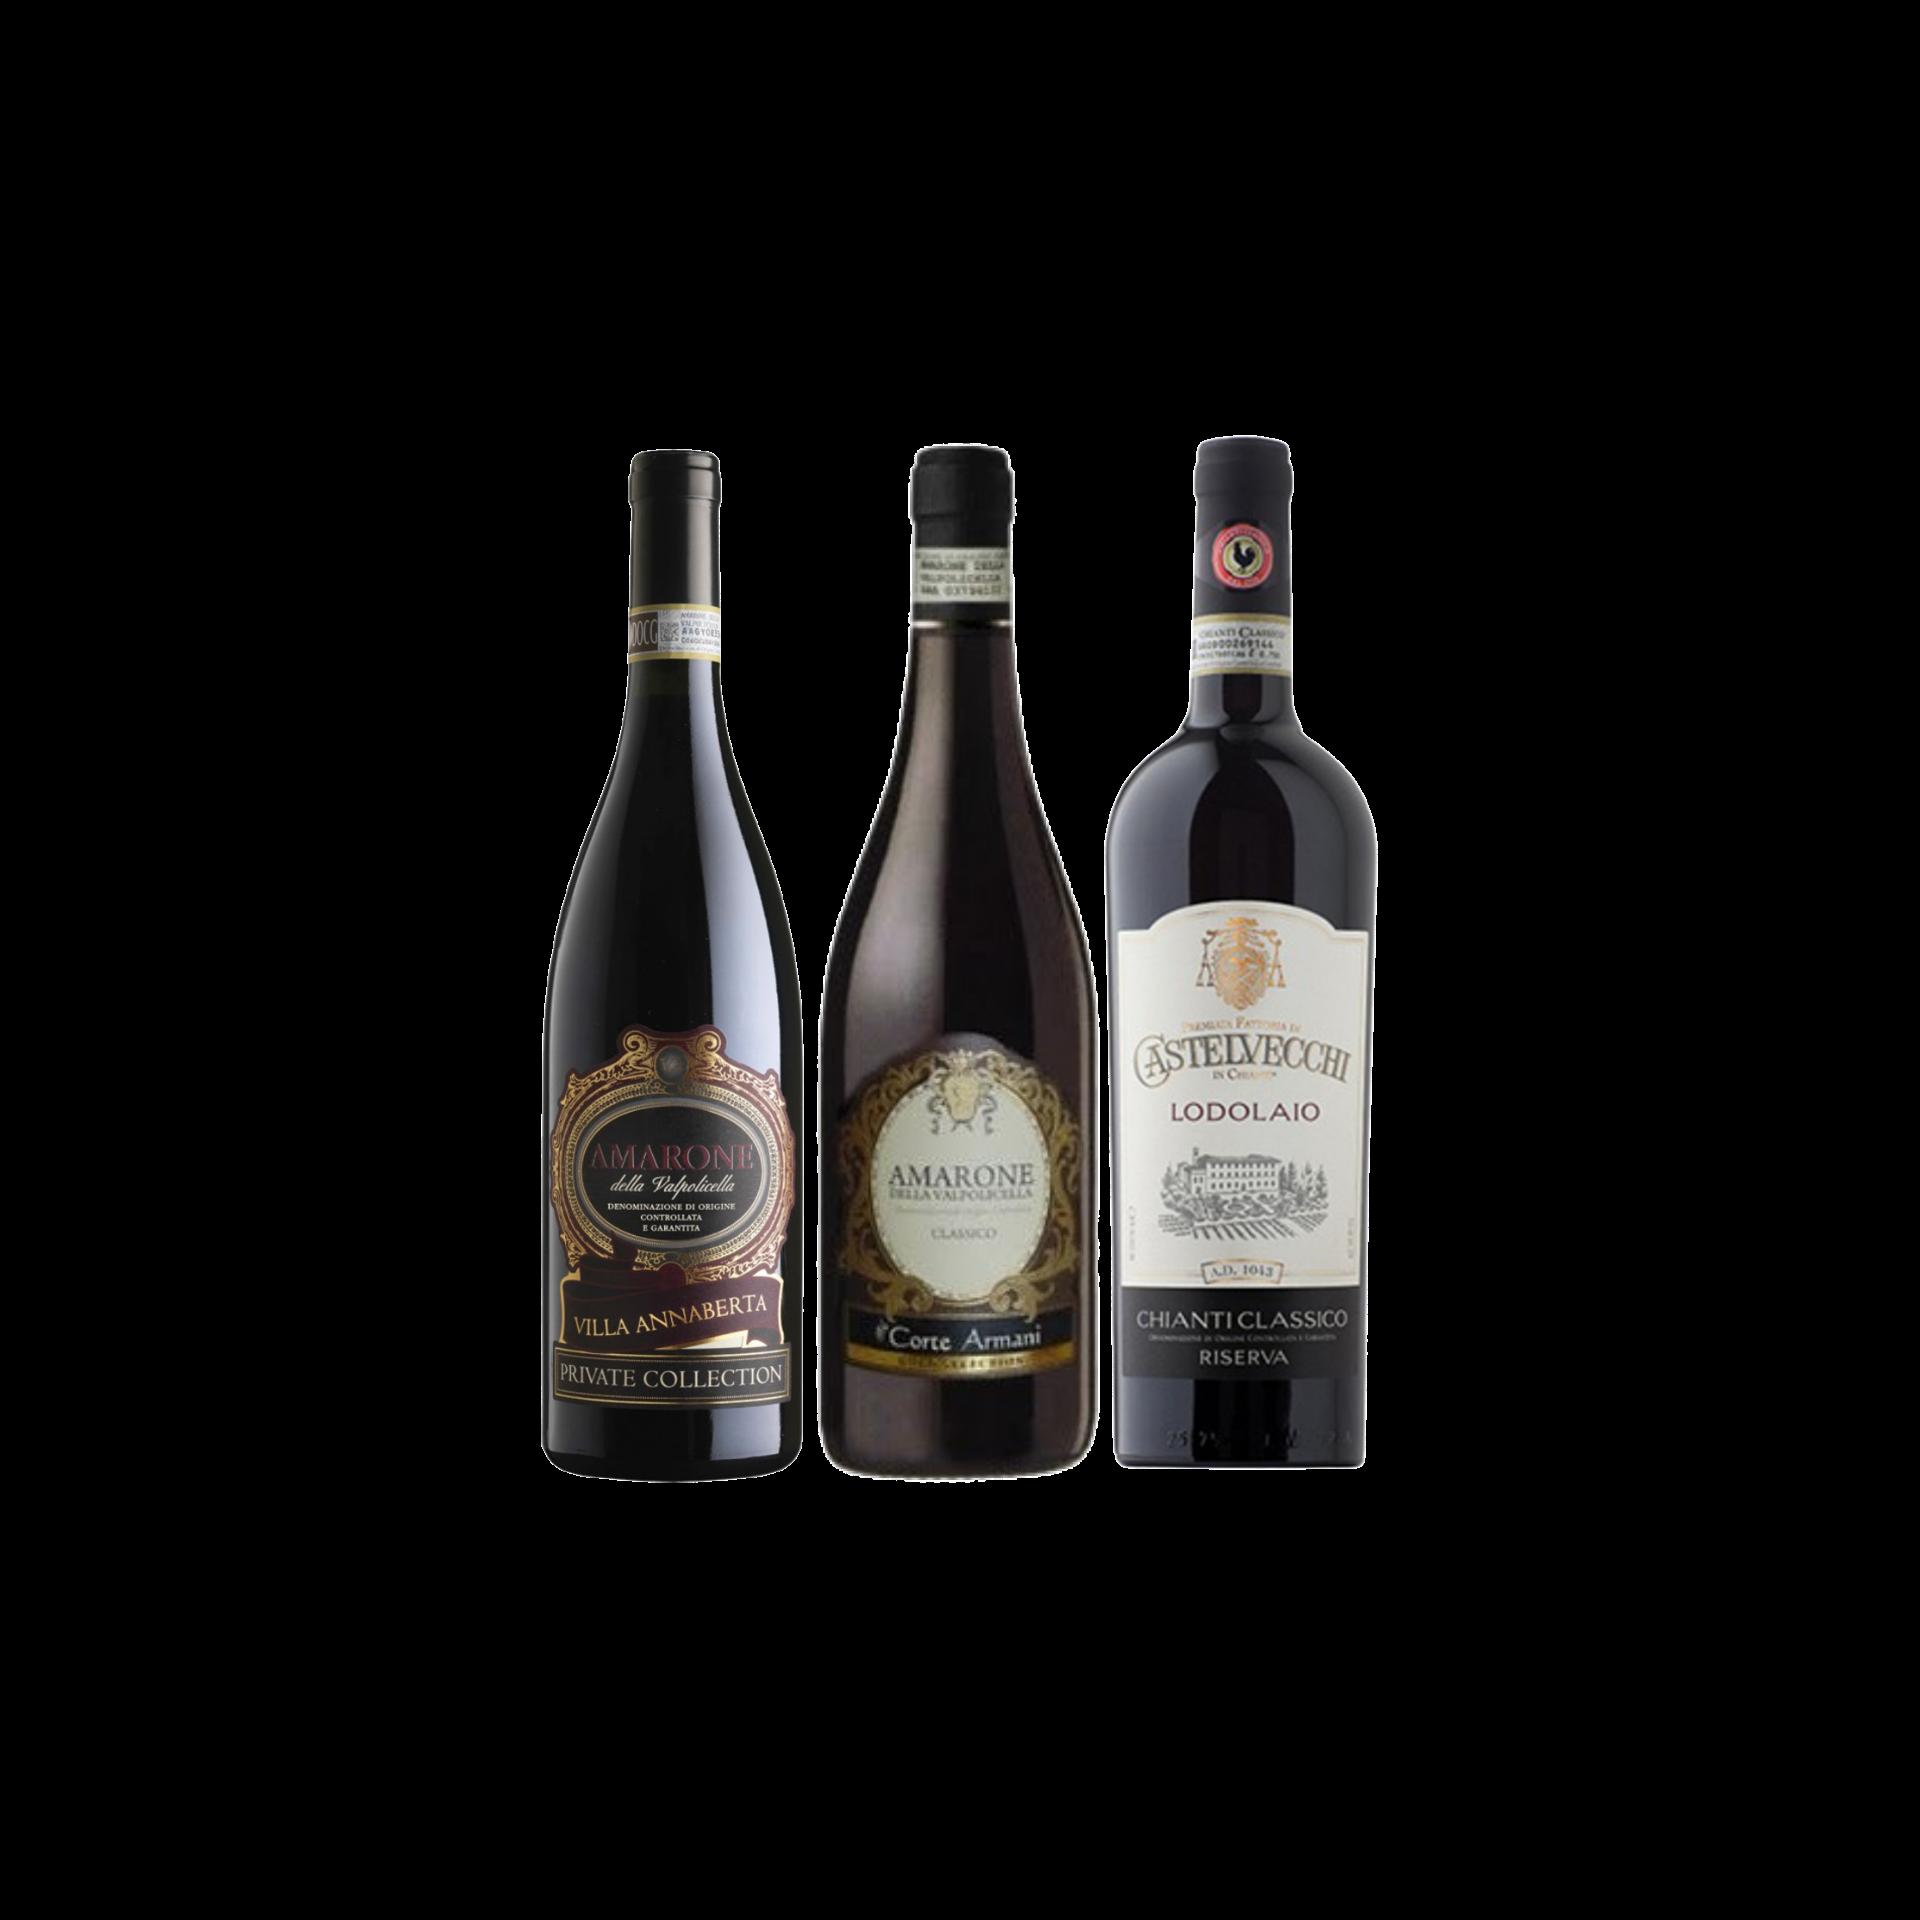 【Bundle B】 Enjoy 2 Bottles of Amarone Plus Chianti Riserva At Only $244 With A Free Set of 6 Schott Zwiesel Wine Glass worth $90